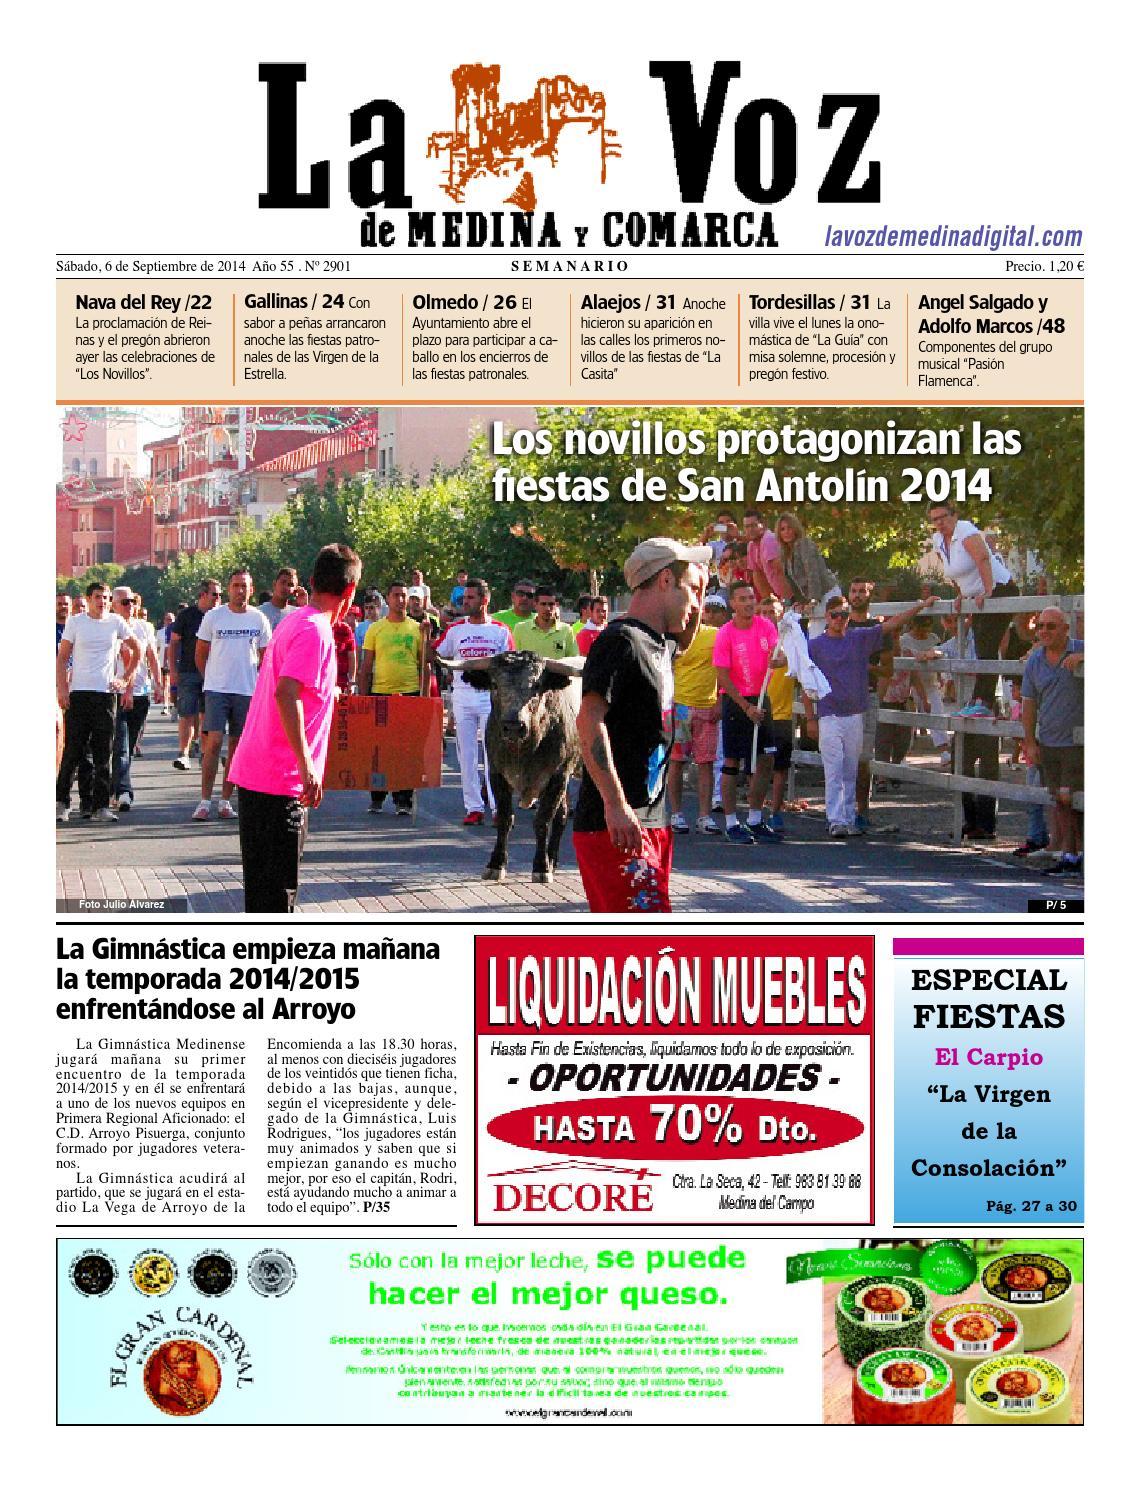 La Voz de Medina 140906 by La Voz de Medina - issuu